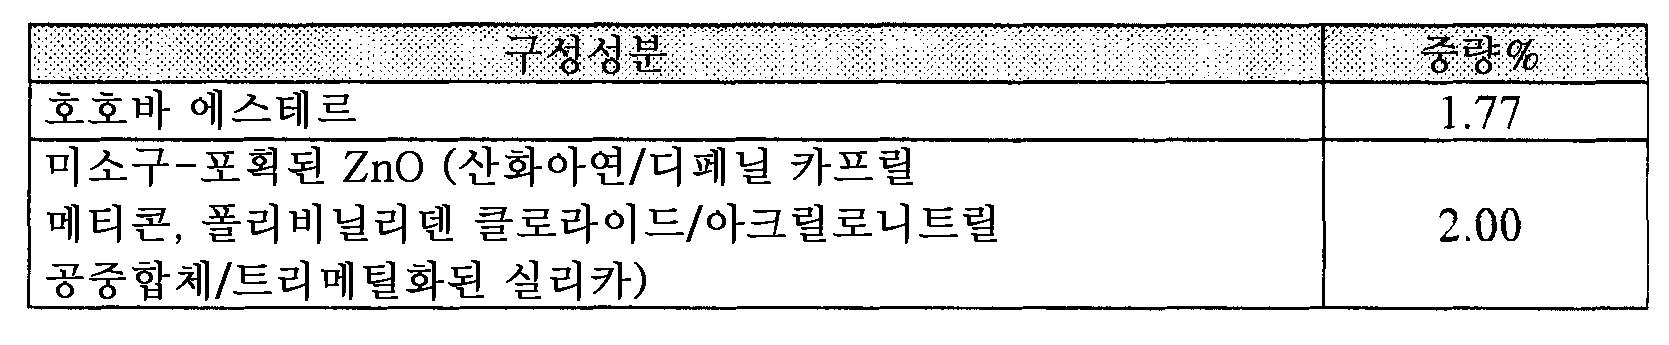 Figure 112010038602093-pct00016